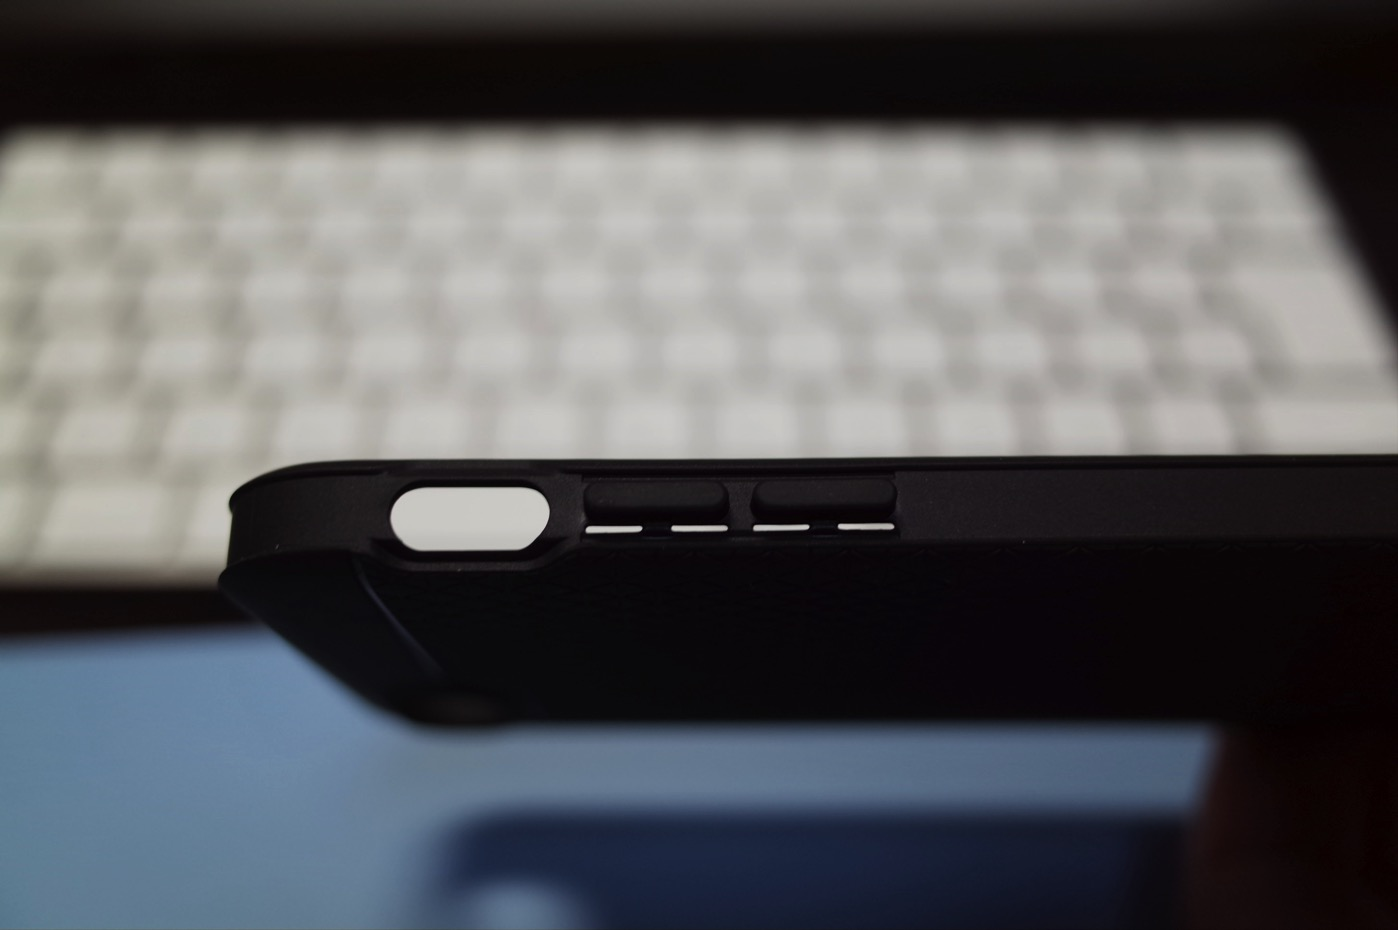 iPhoneケース「ネオ・ハイブリッド米軍MIL規格取得 二重構造バンパー」-8